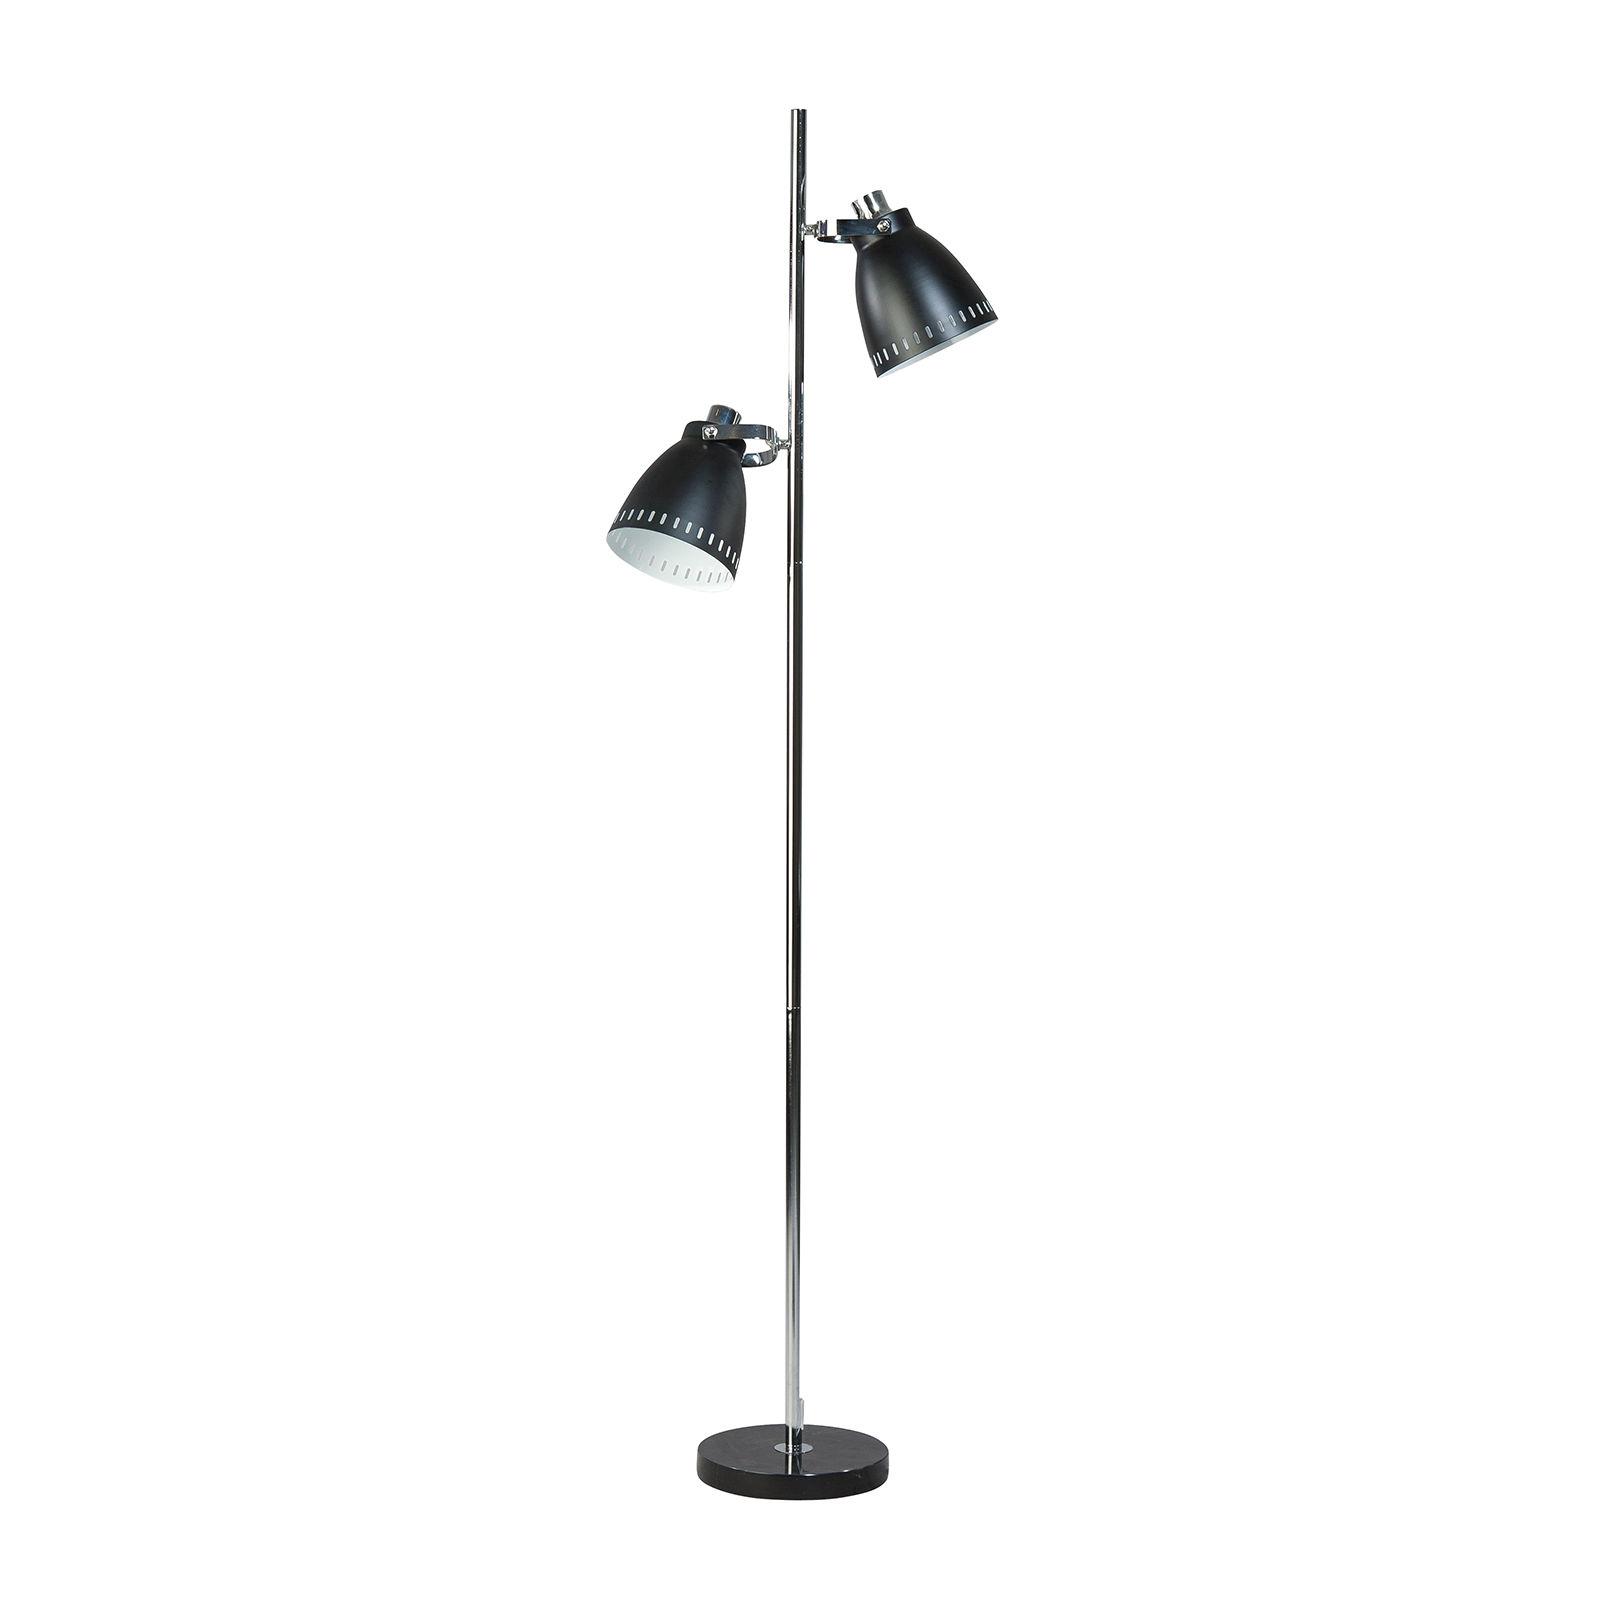 Acate vloerlamp ETH 2x zwart/chroom